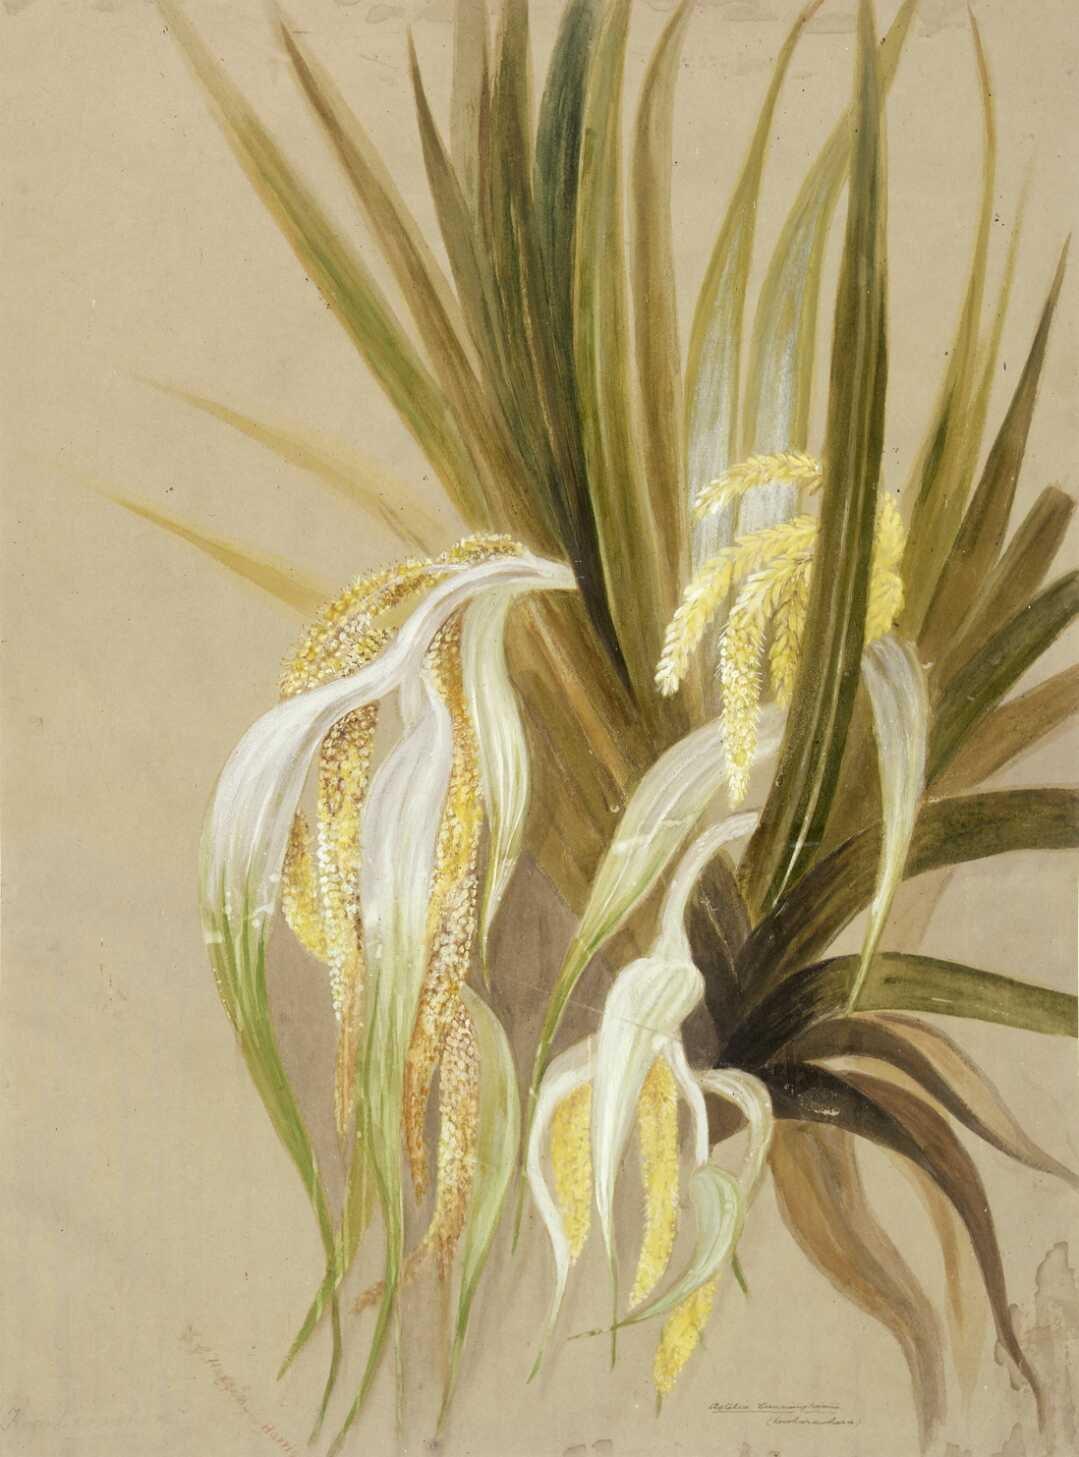 The New Zealand shrub astelia in flower